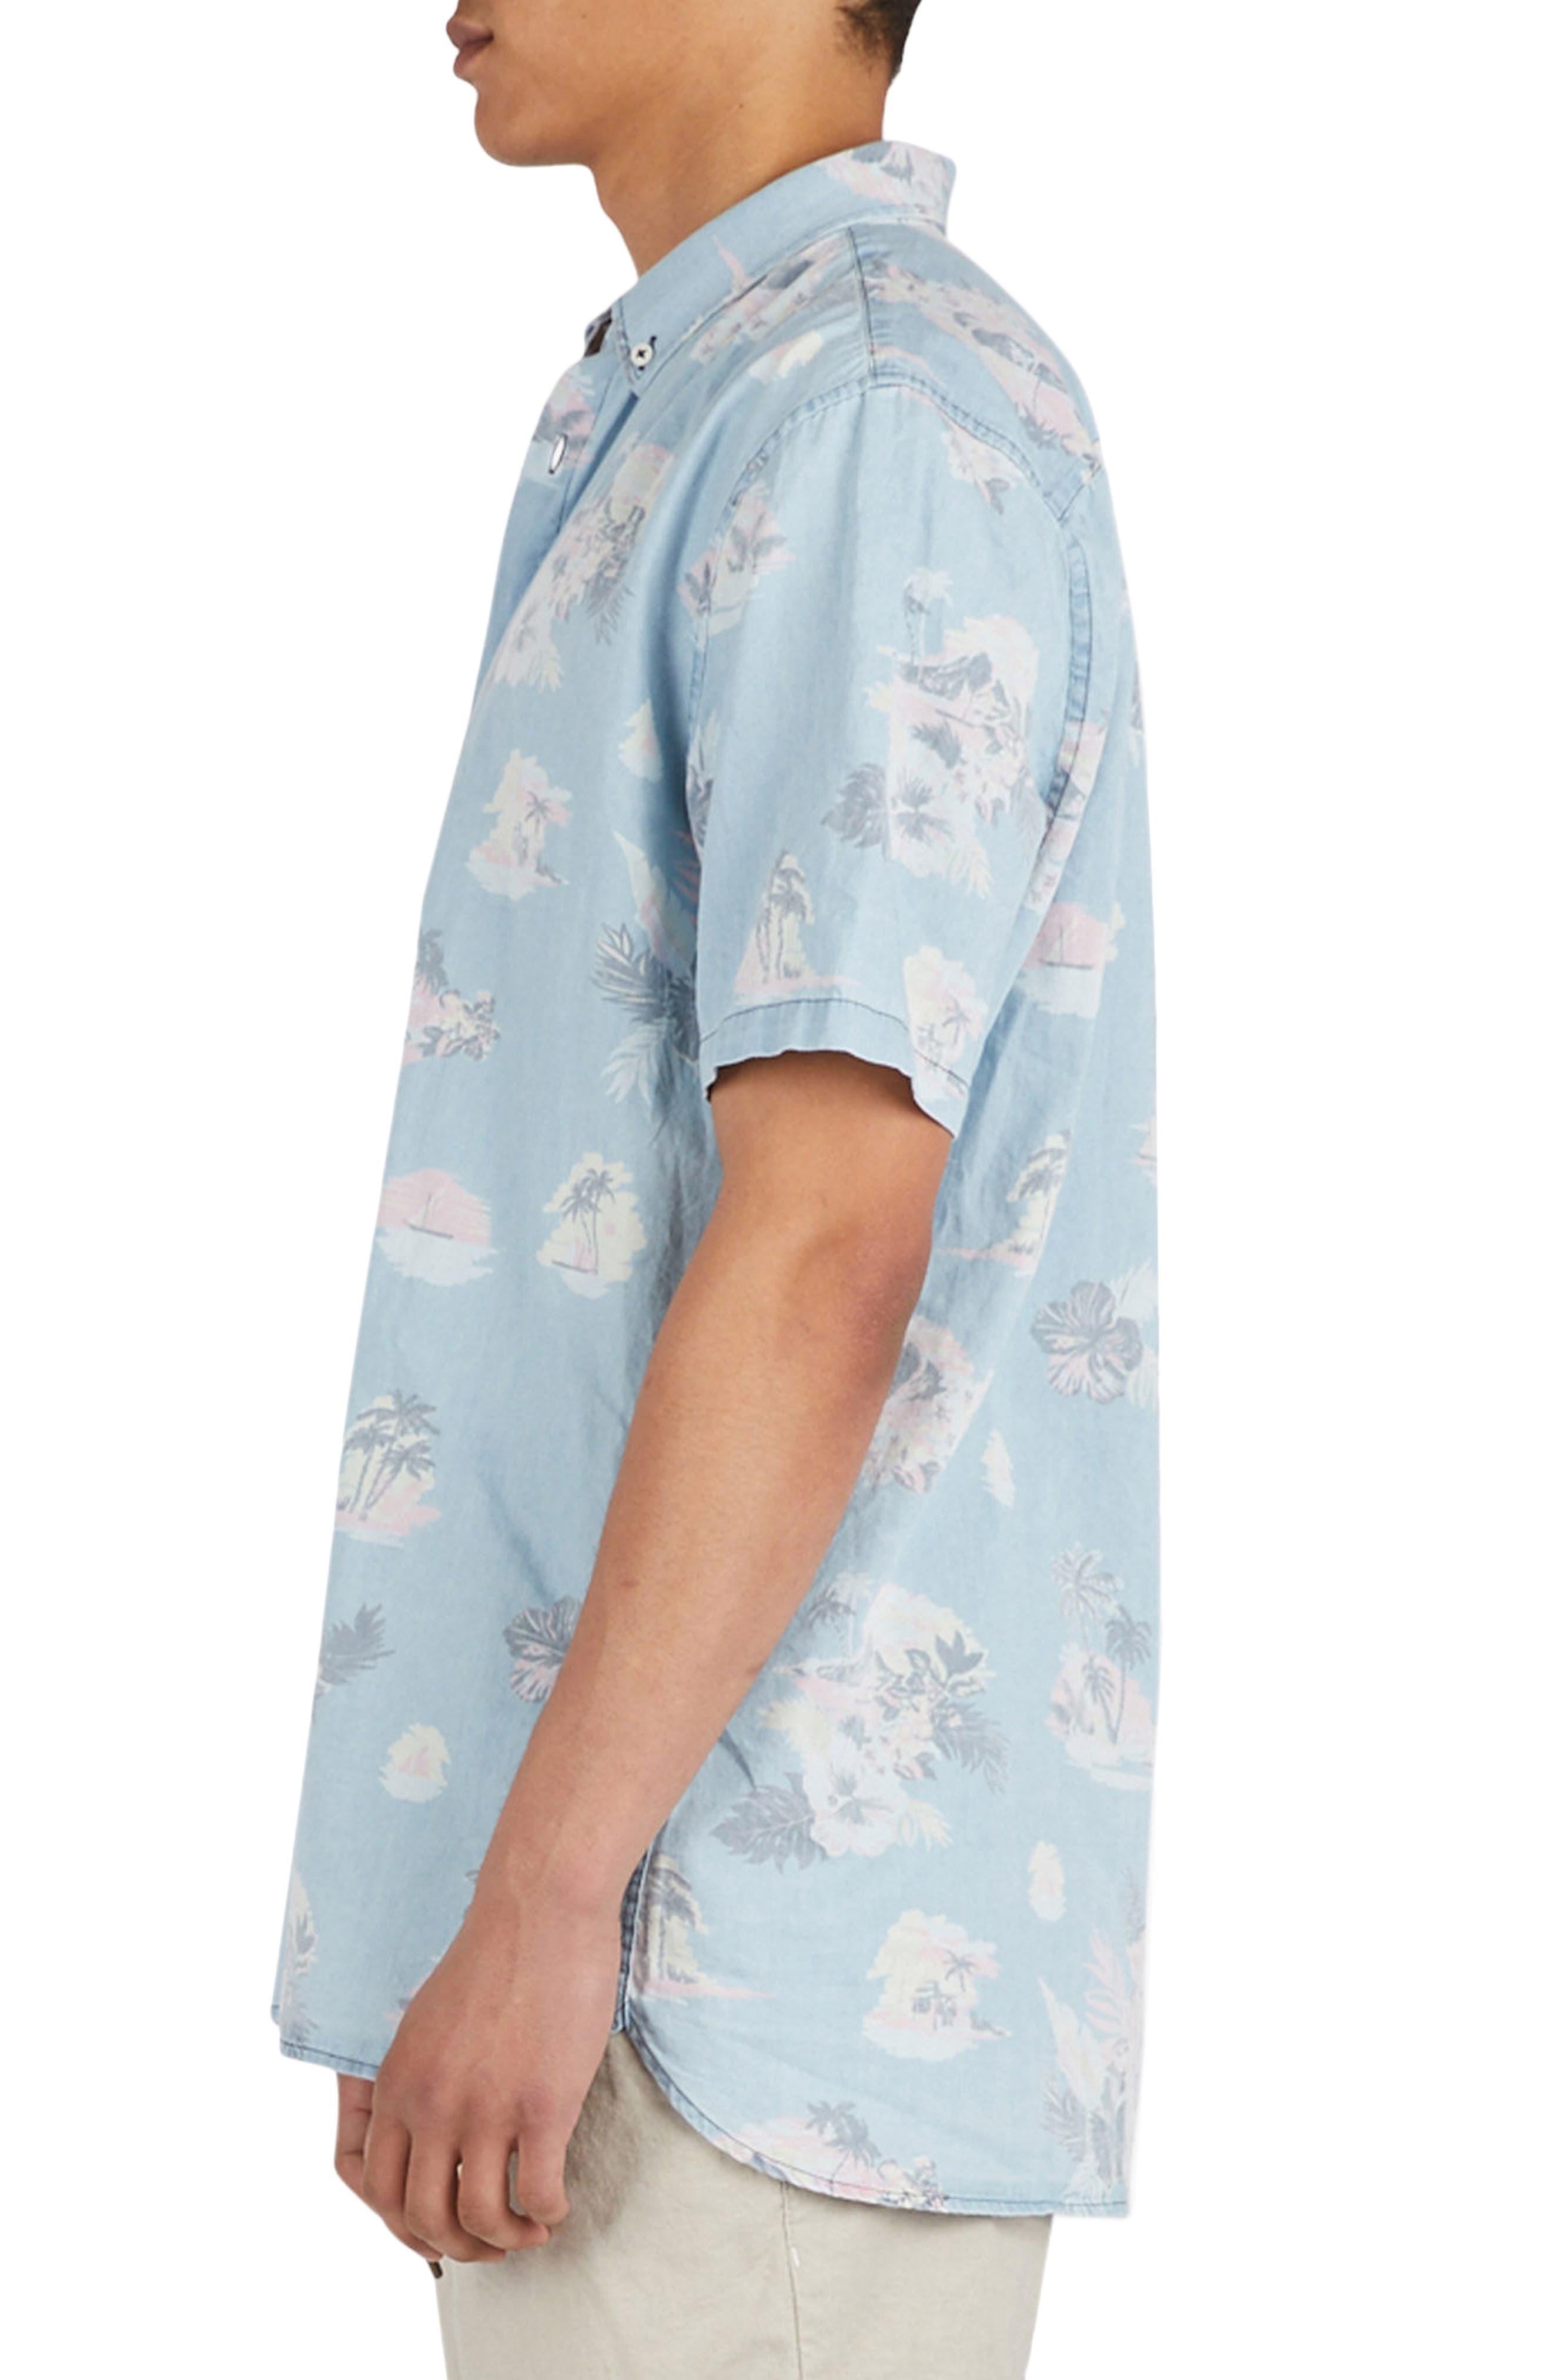 Tropical Print Woven Shirt,                             Alternate thumbnail 4, color,                             Indigo/ Floral